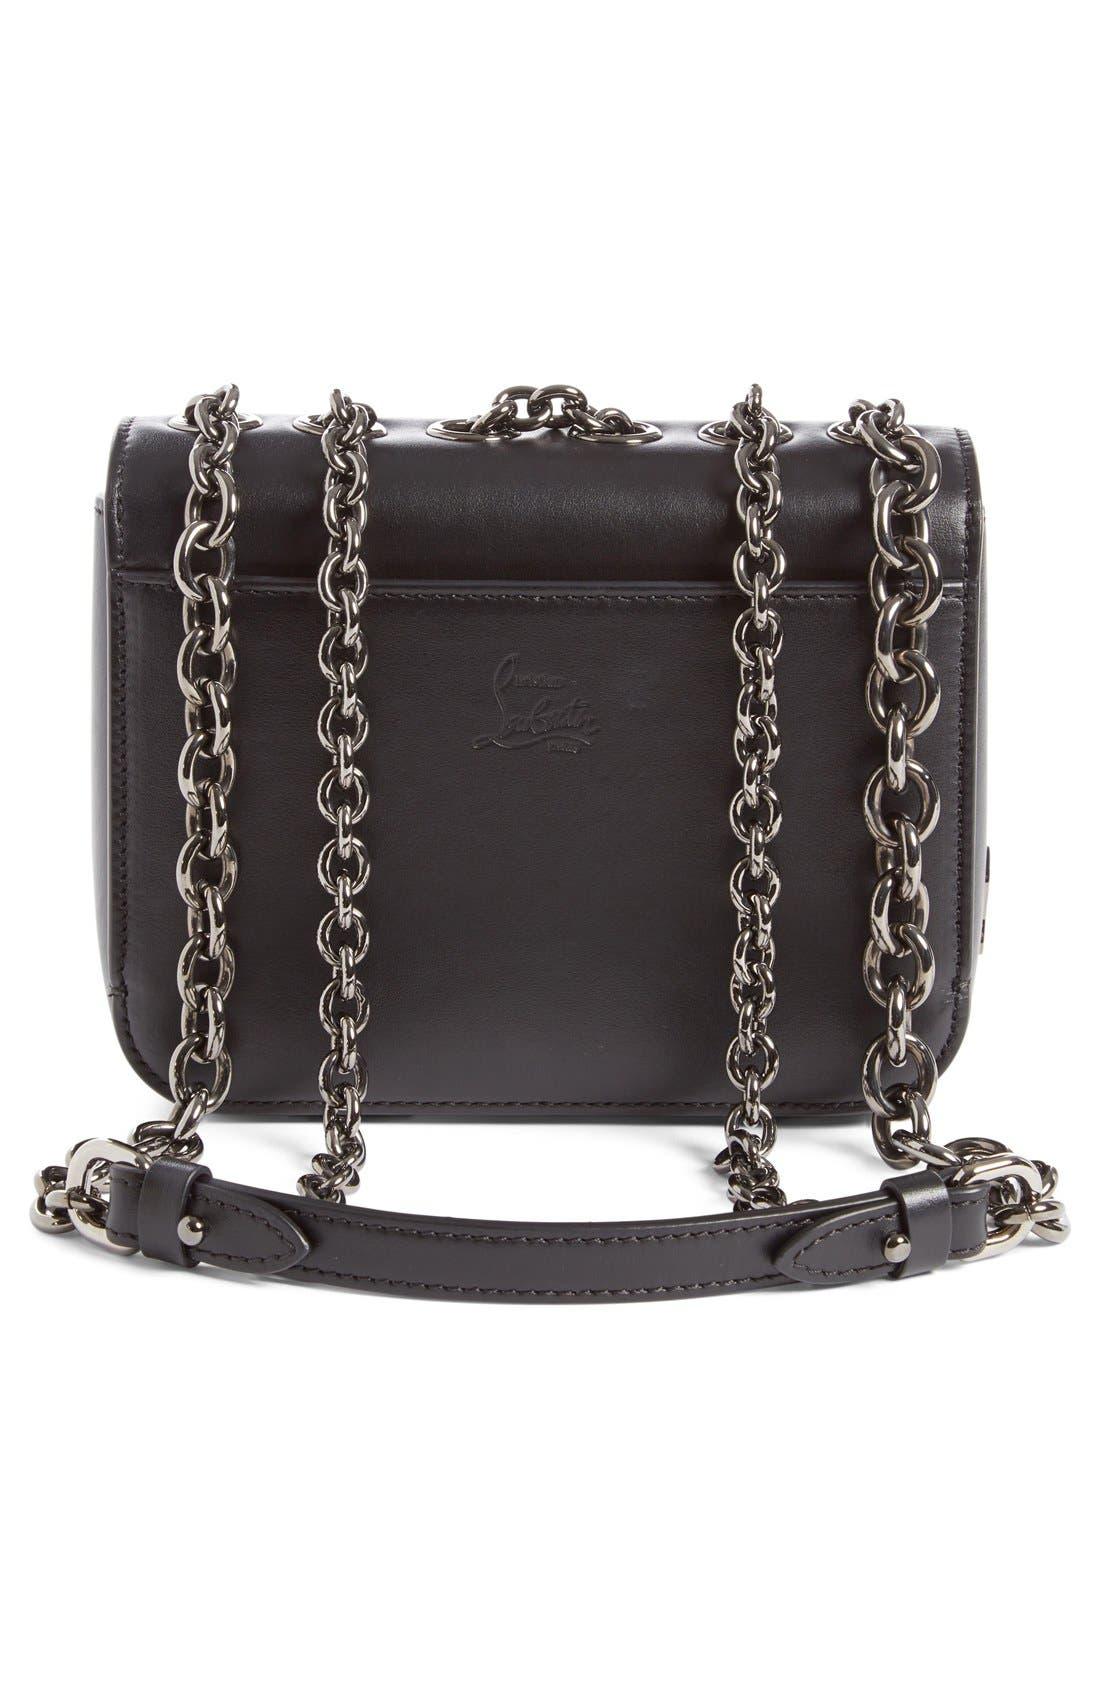 Alternate Image 3  - Christian Louboutin 'Small Sweet Charity' Spiked Calfskin Shoulder/Crossbody Bag